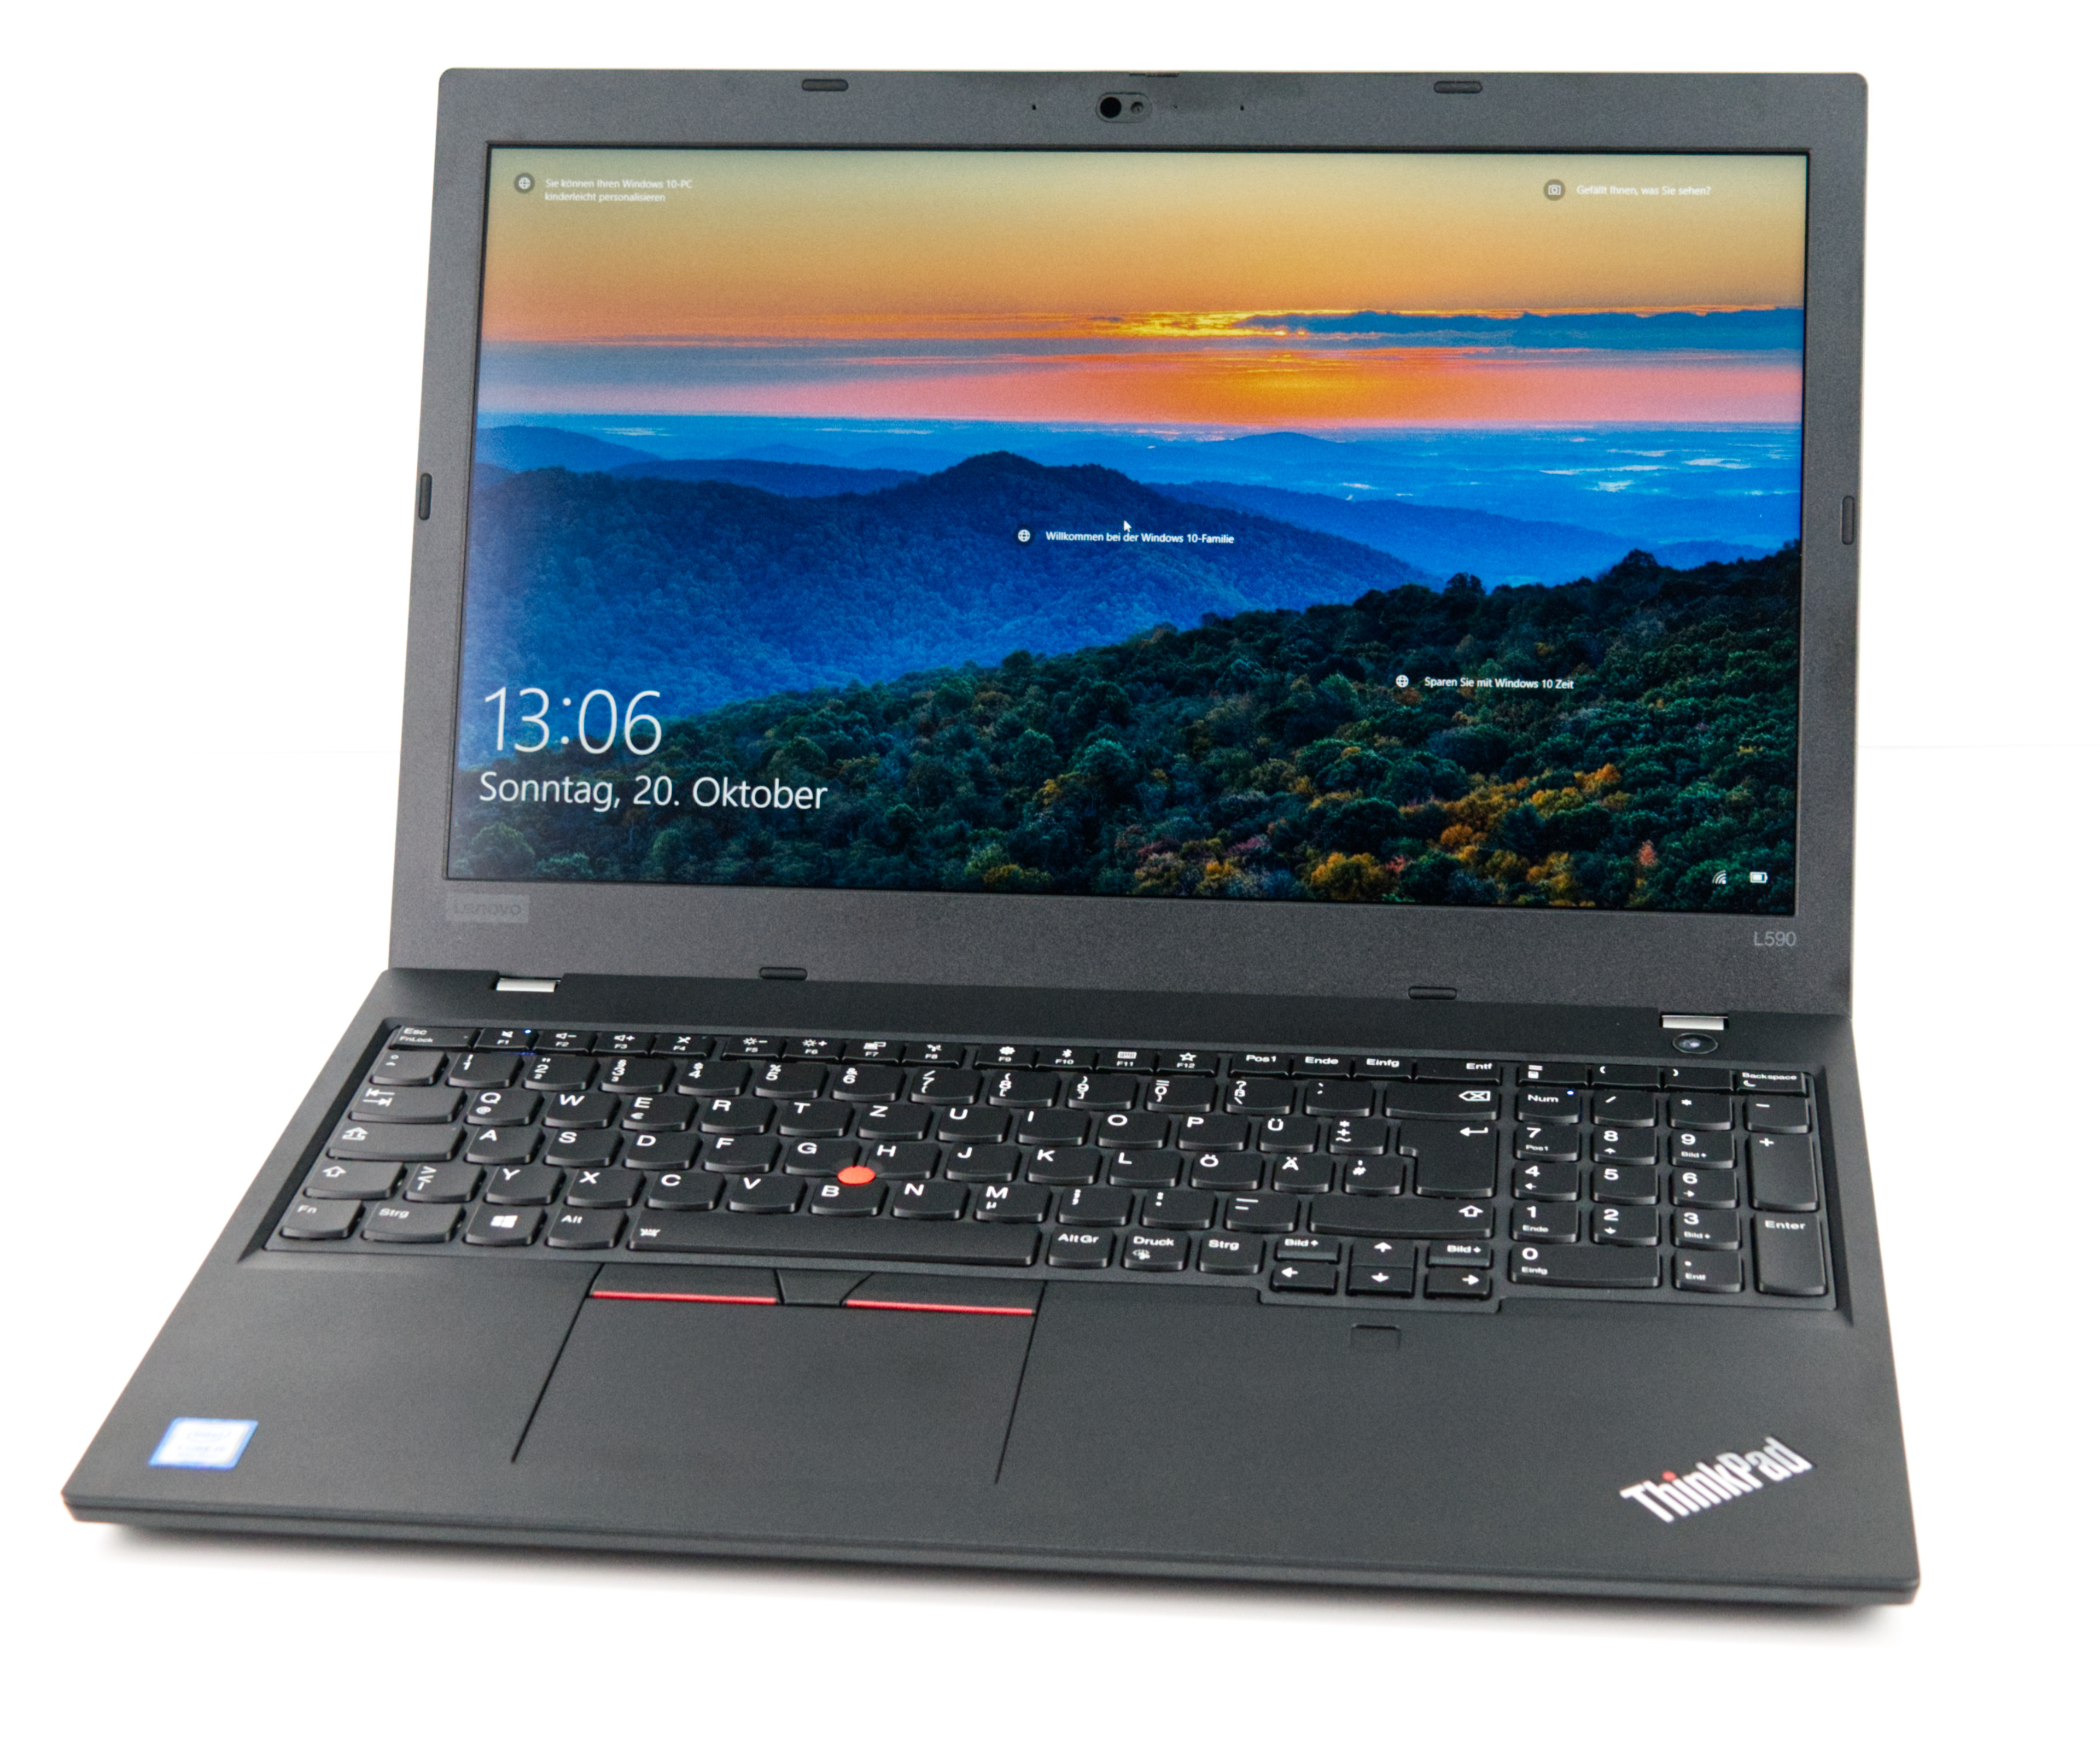 Lenovos ThinkPad L590 bleibt hinter den Erwartungen